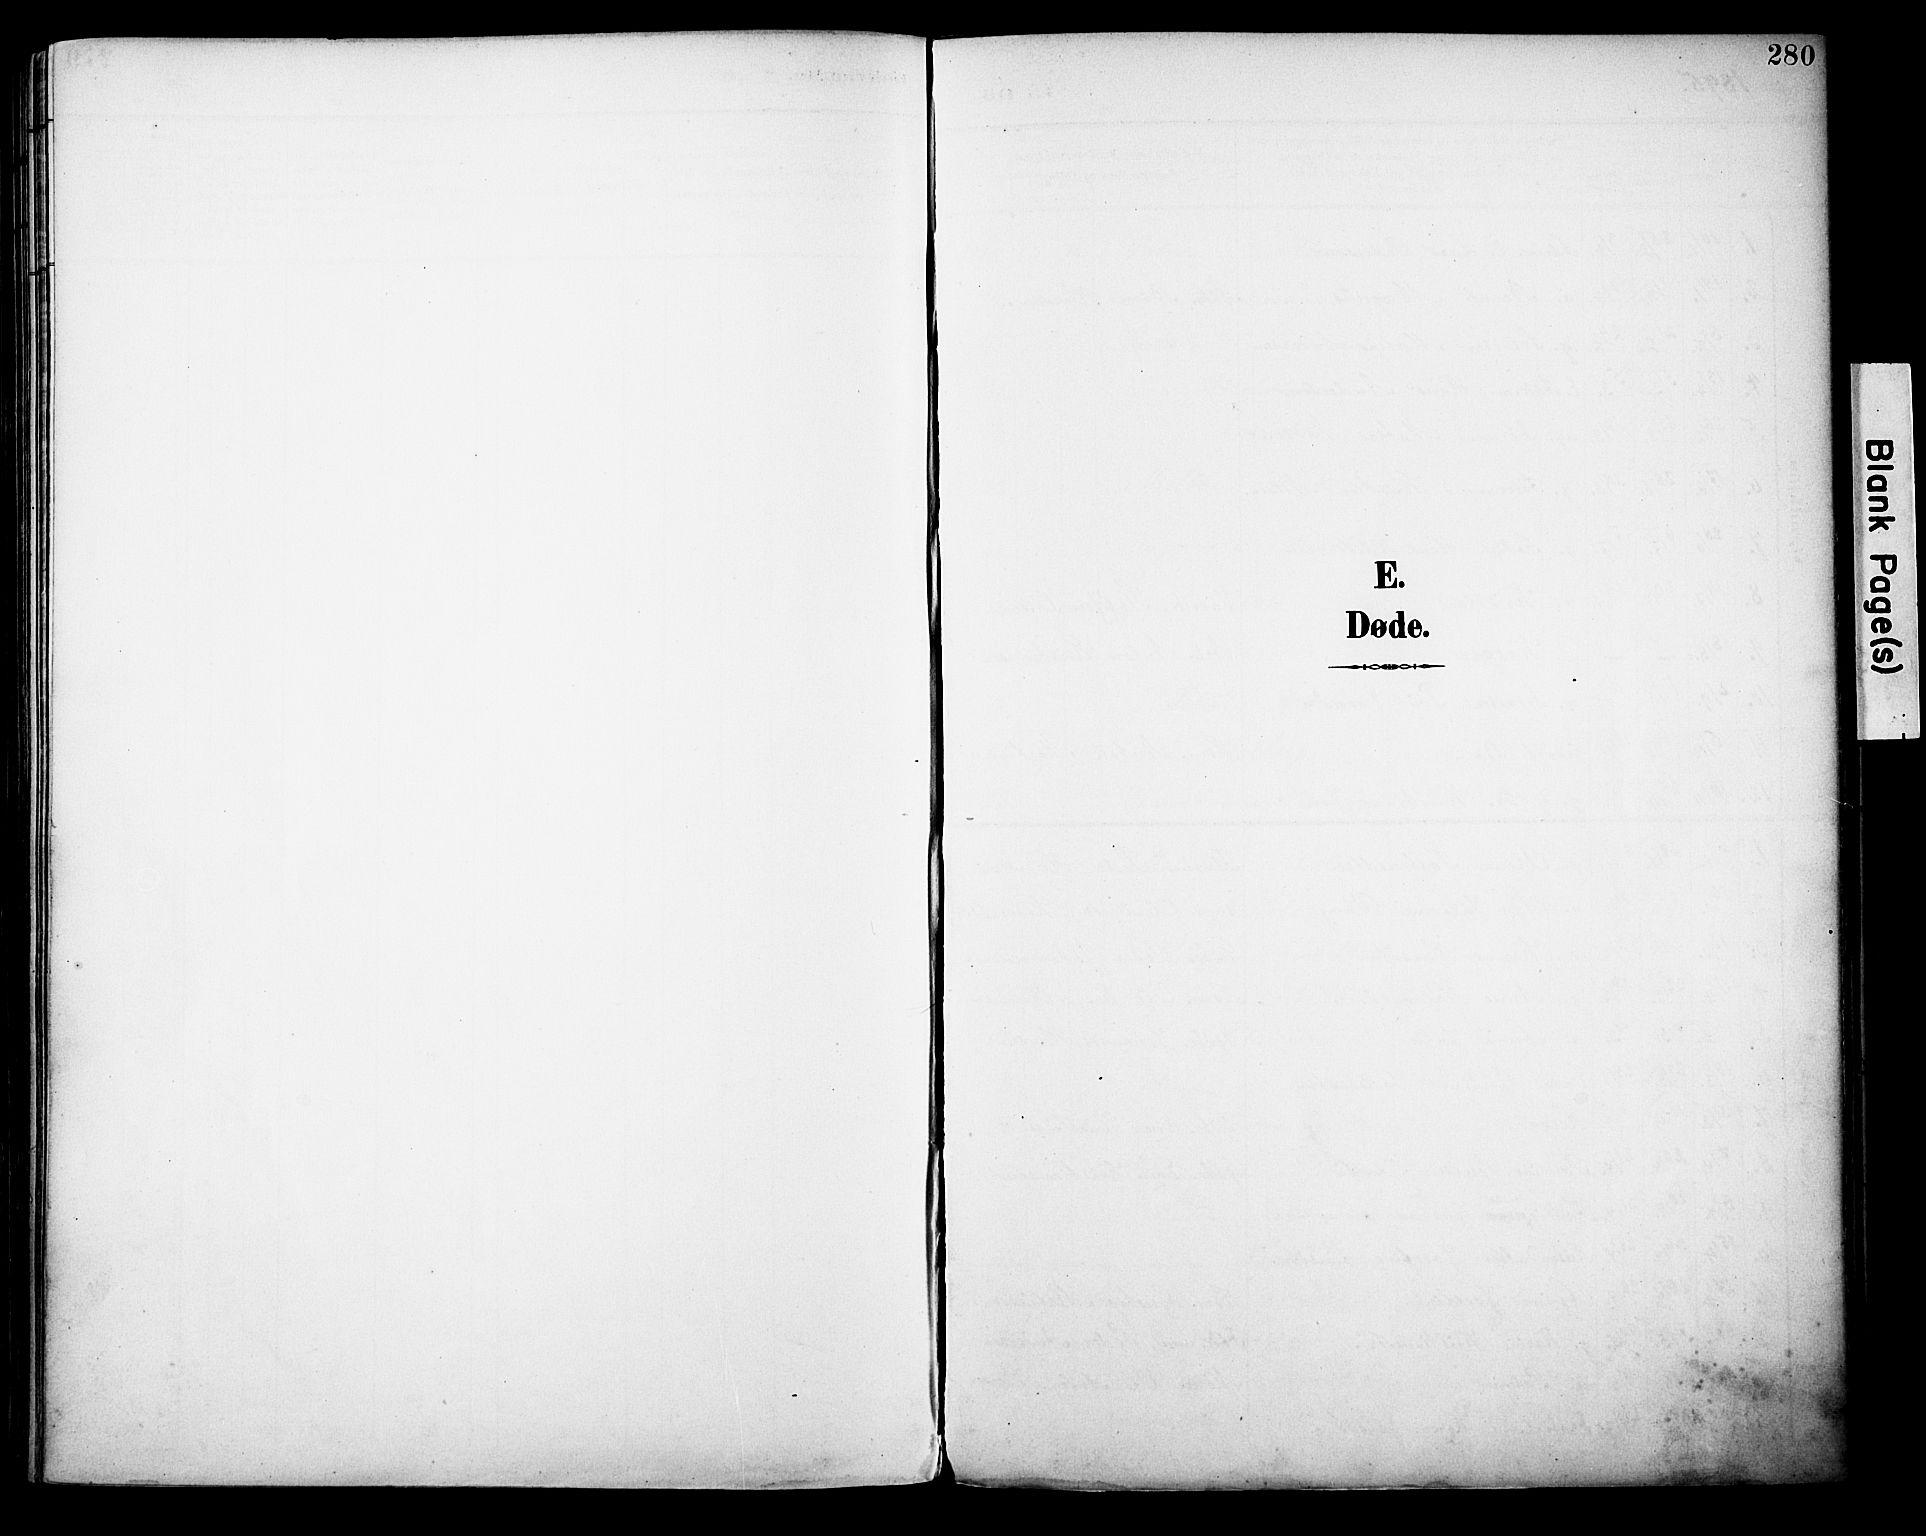 SAH, Vestre Toten prestekontor, H/Ha/Haa/L0013: Ministerialbok nr. 13, 1895-1911, s. 280